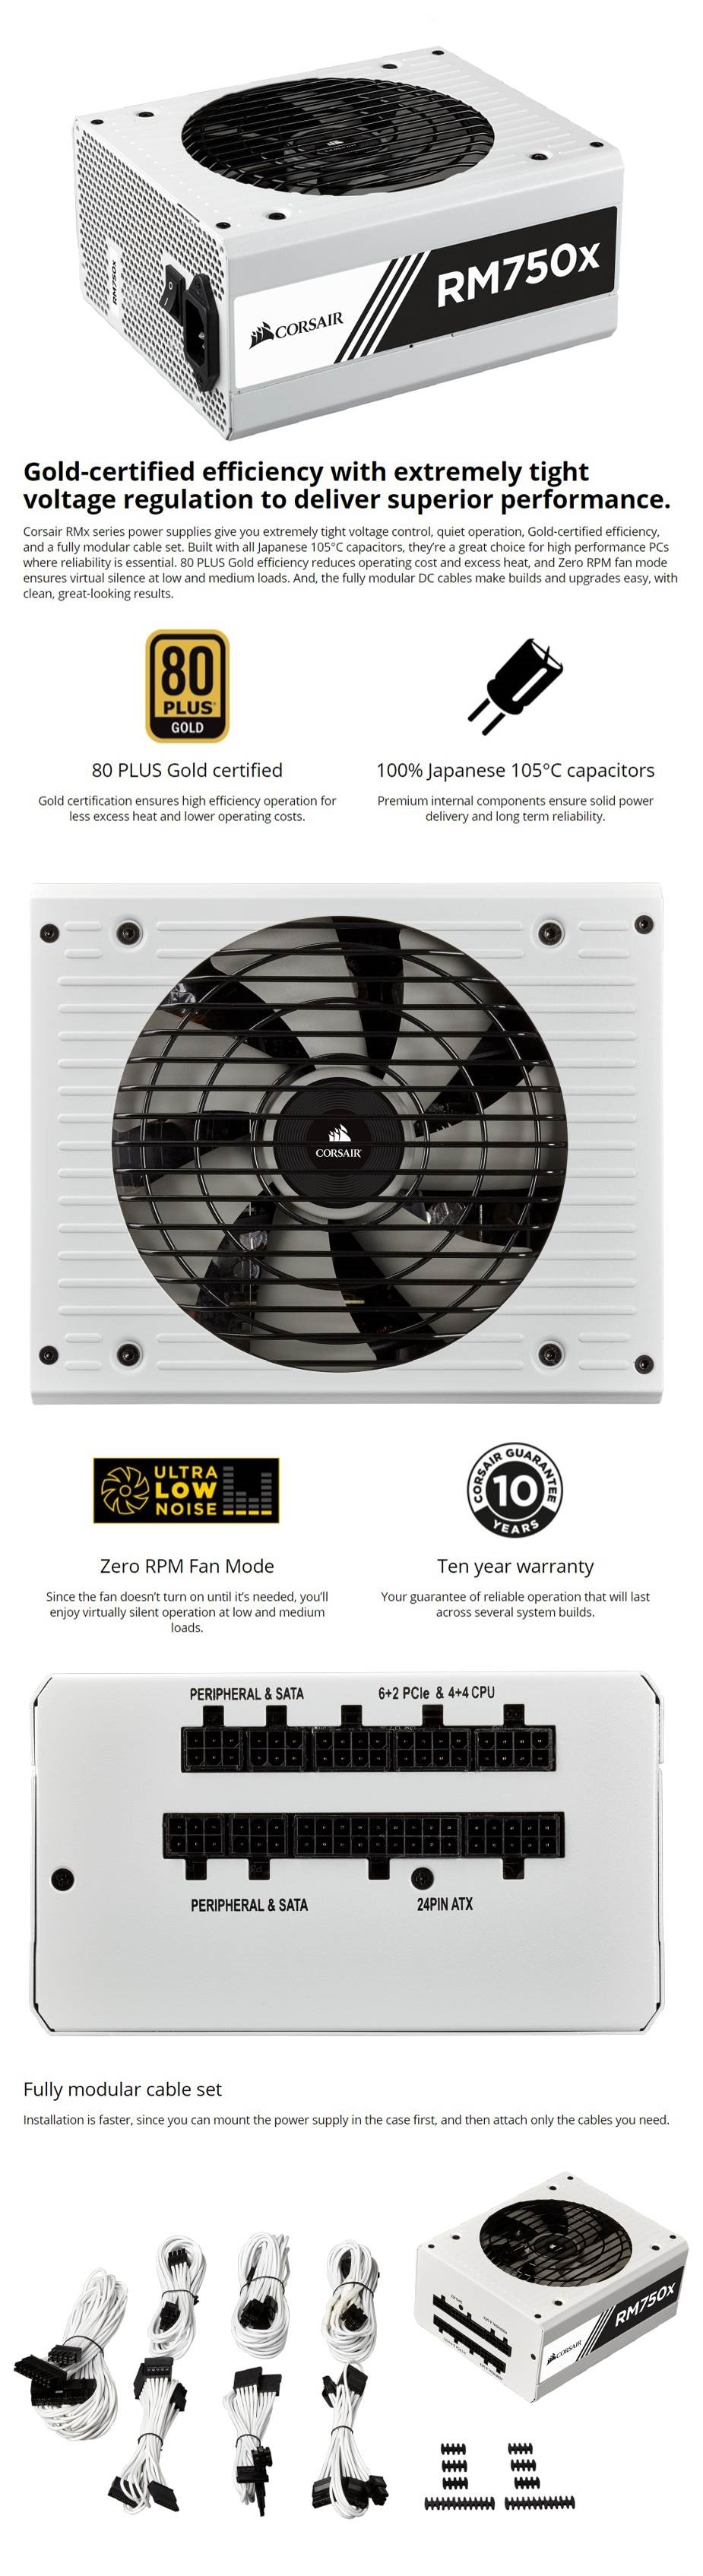 Magnificent Computer Power Supply Specs Motif - Wiring Diagram Ideas ...